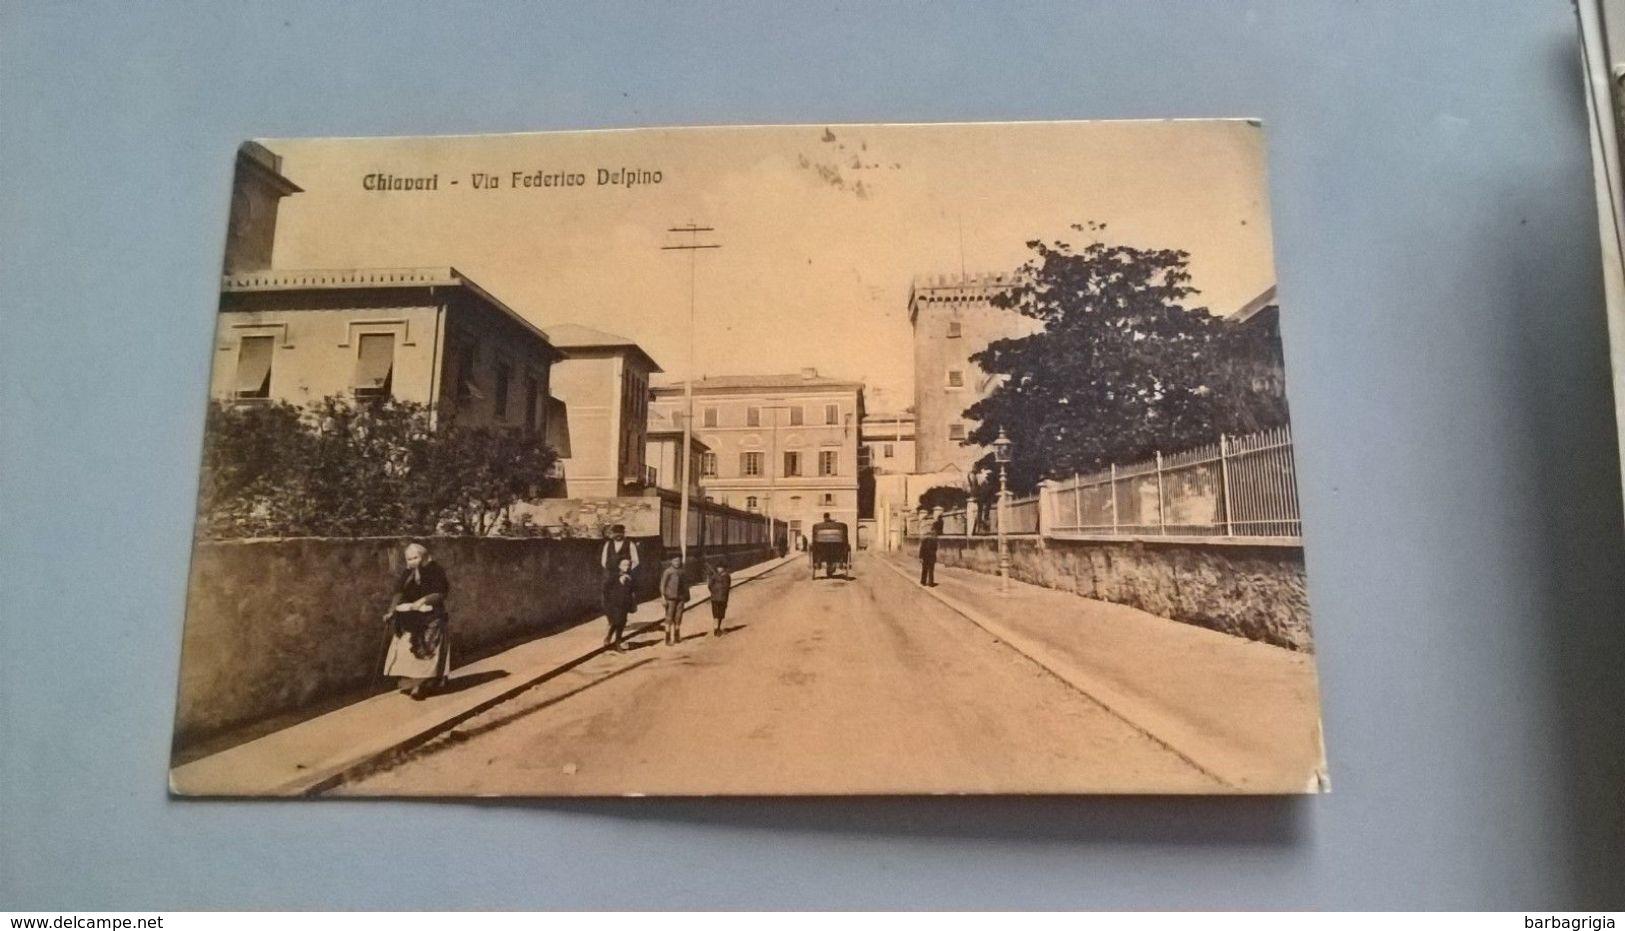 CARTOLINA CHIAVARI - VIA FEDERICO DELPINO - Genova (Genoa)